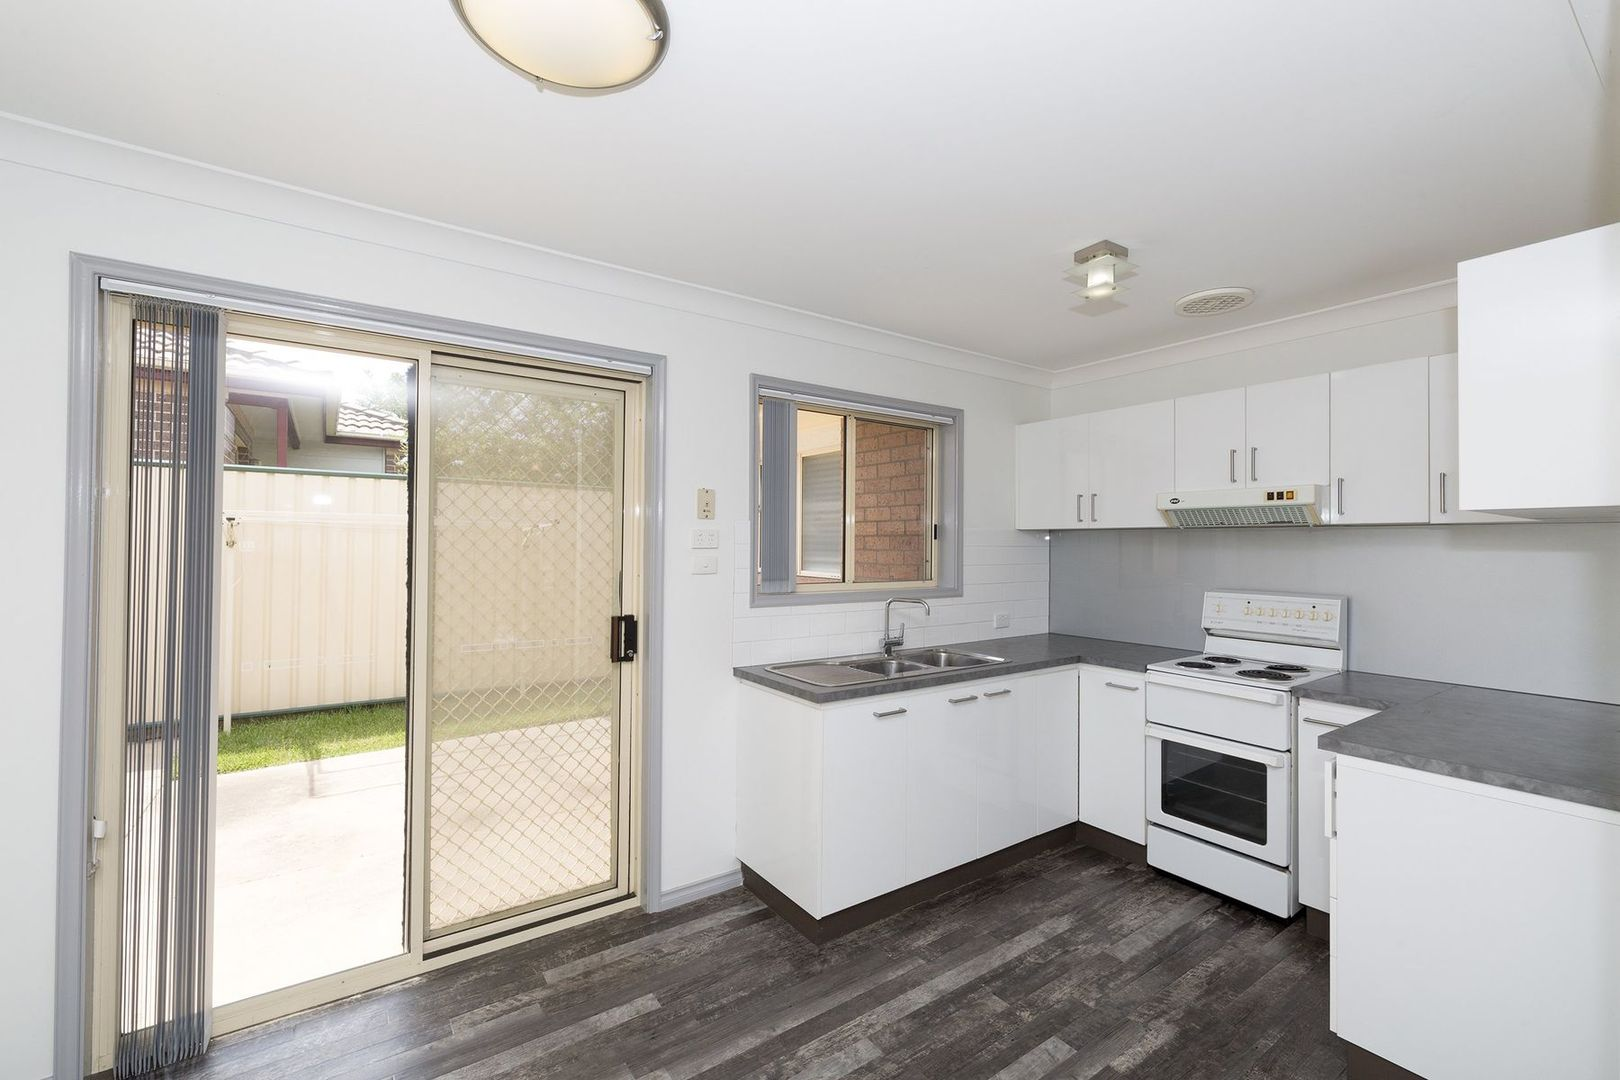 8/8-10 McLachlan Avenue, Long Jetty NSW 2261, Image 2